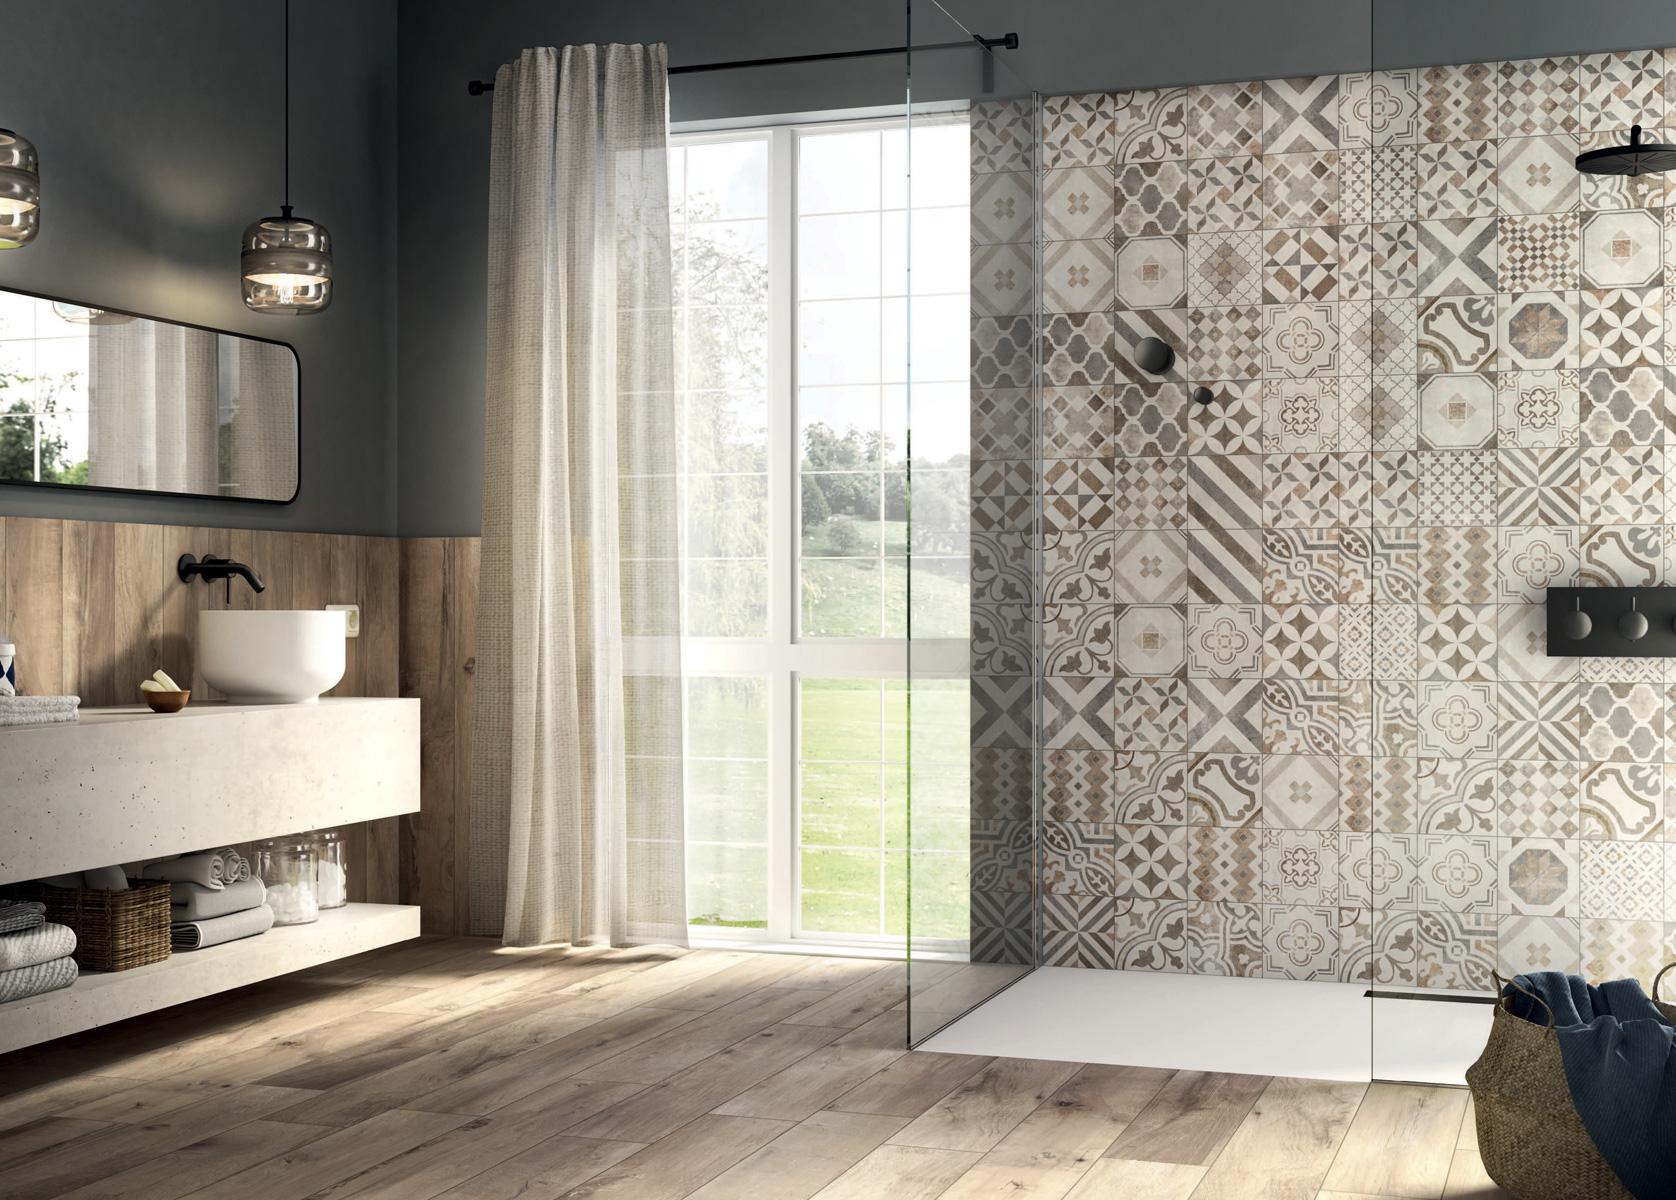 Inspiration salle de bain - carrelage